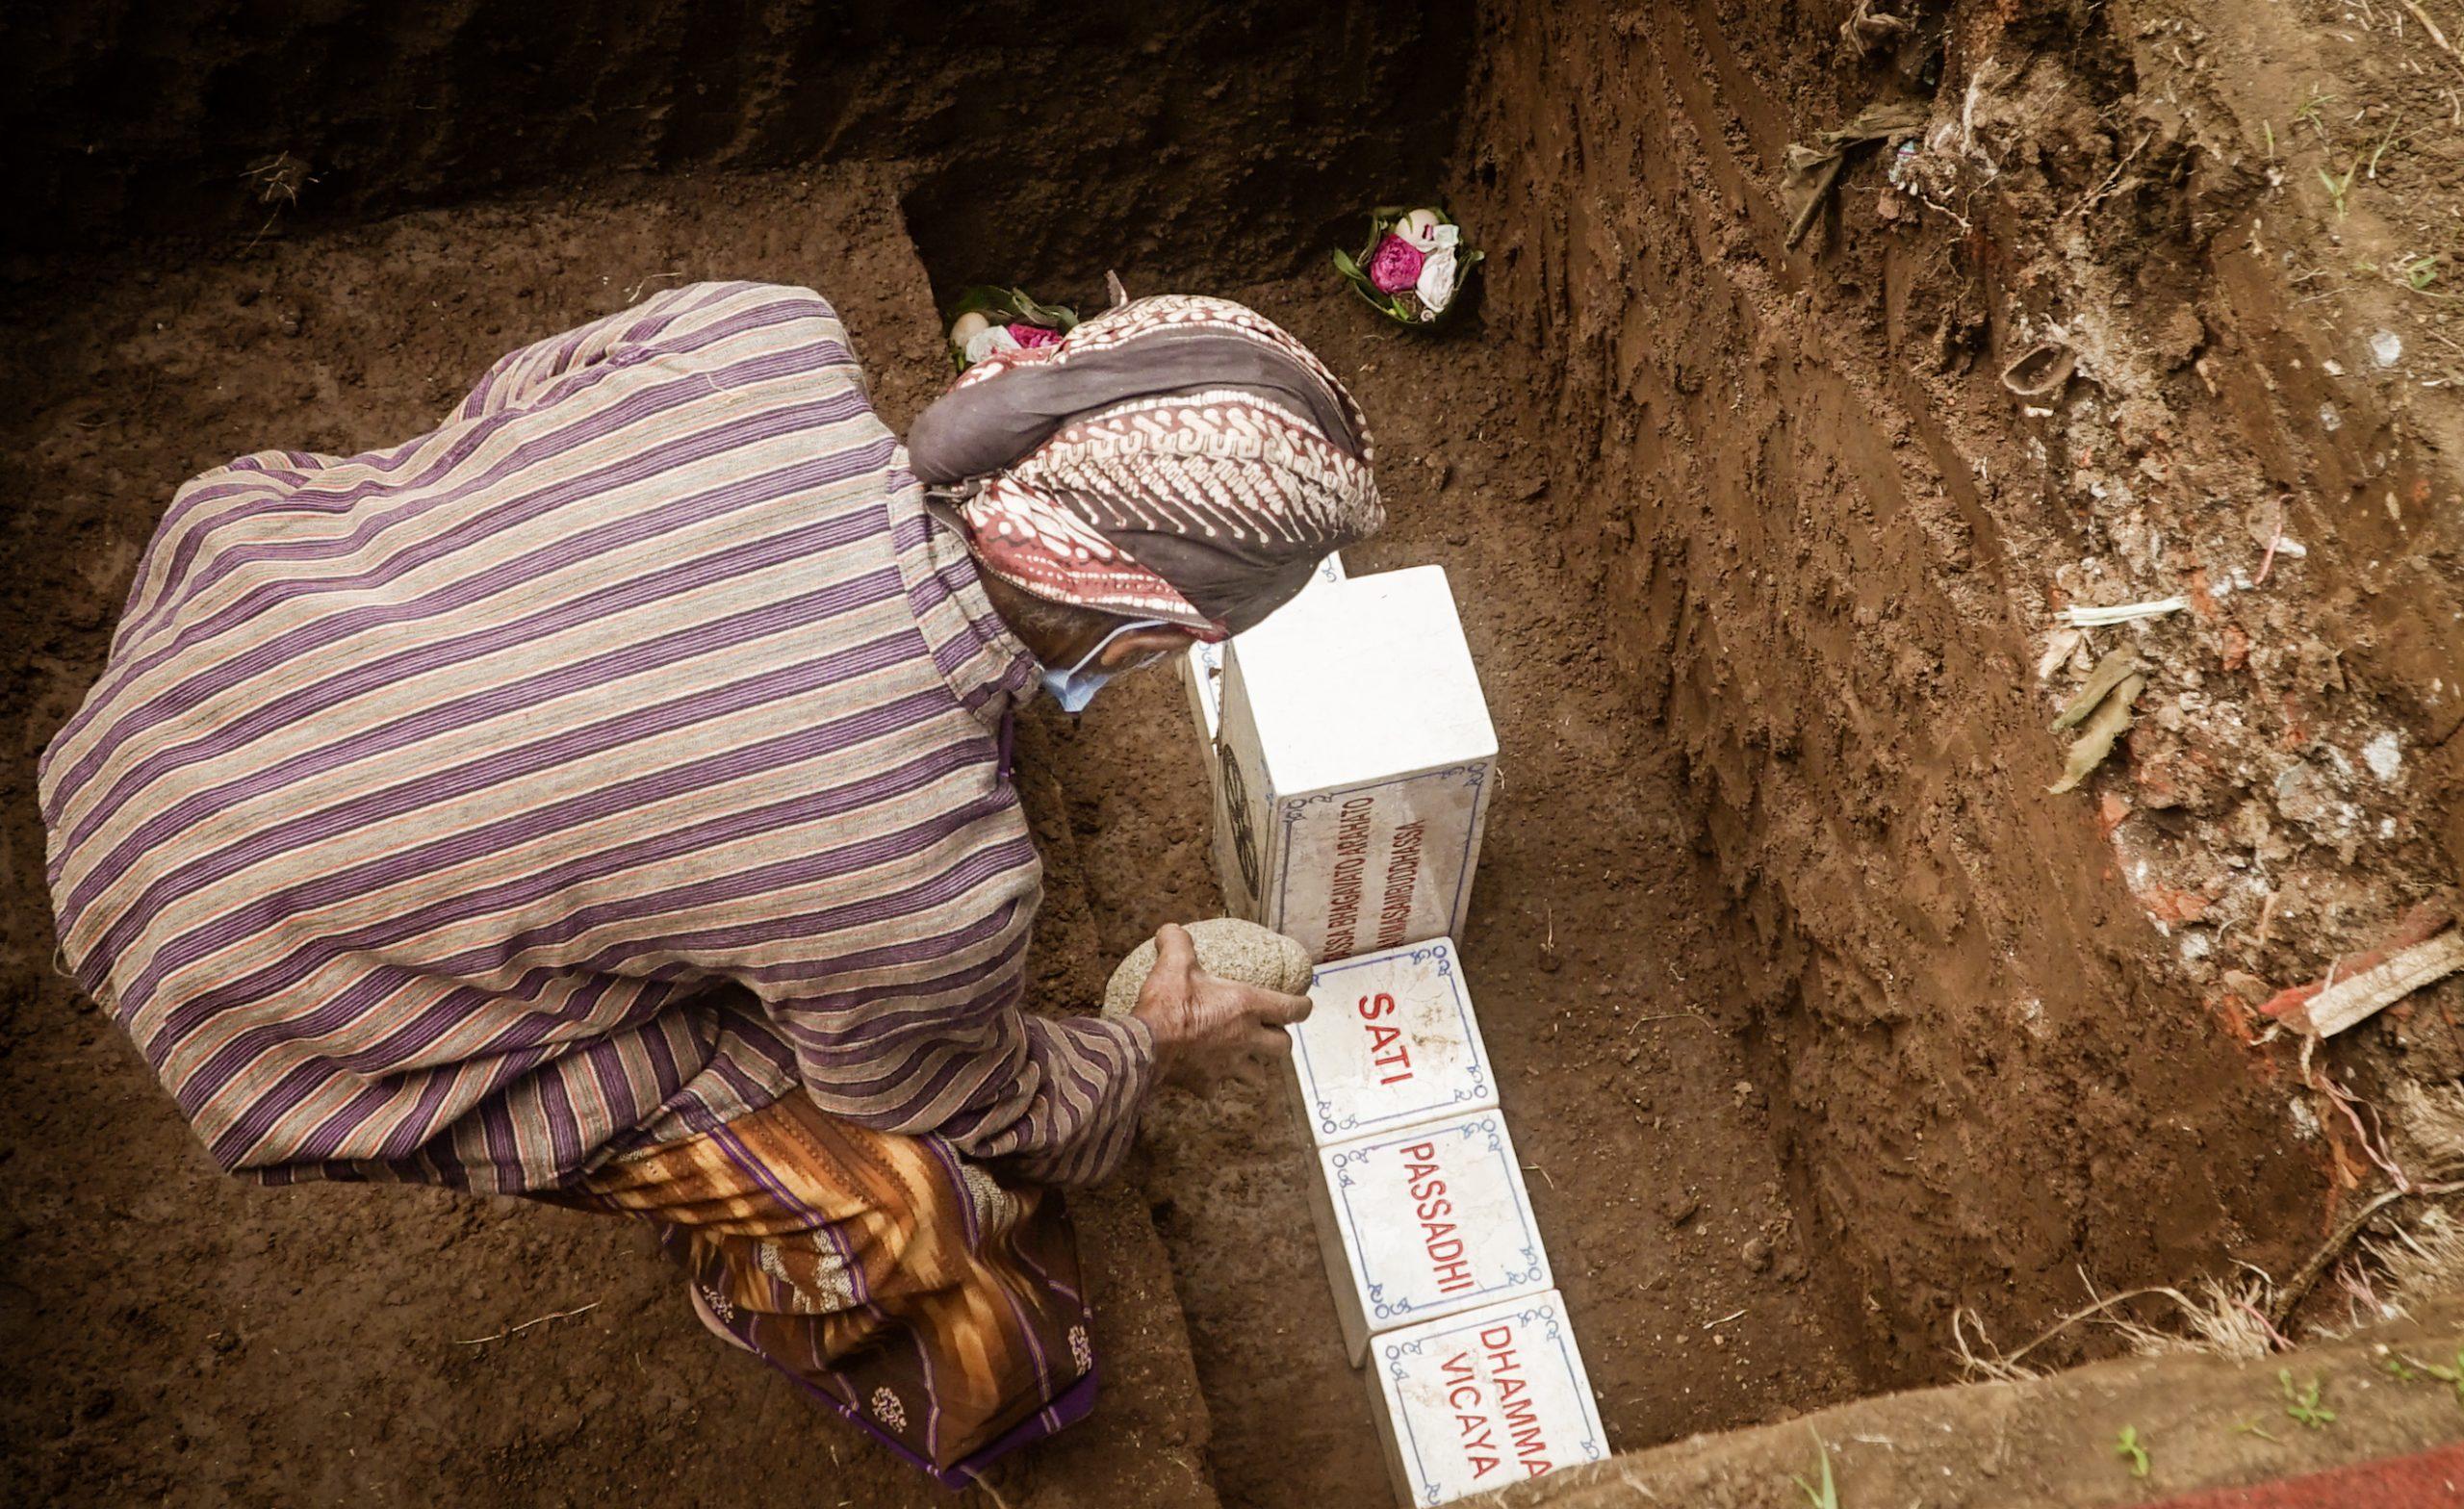 Sembahyang Tak Lagi Berdesakan, Wihara di Dusun Krecek Diperluas